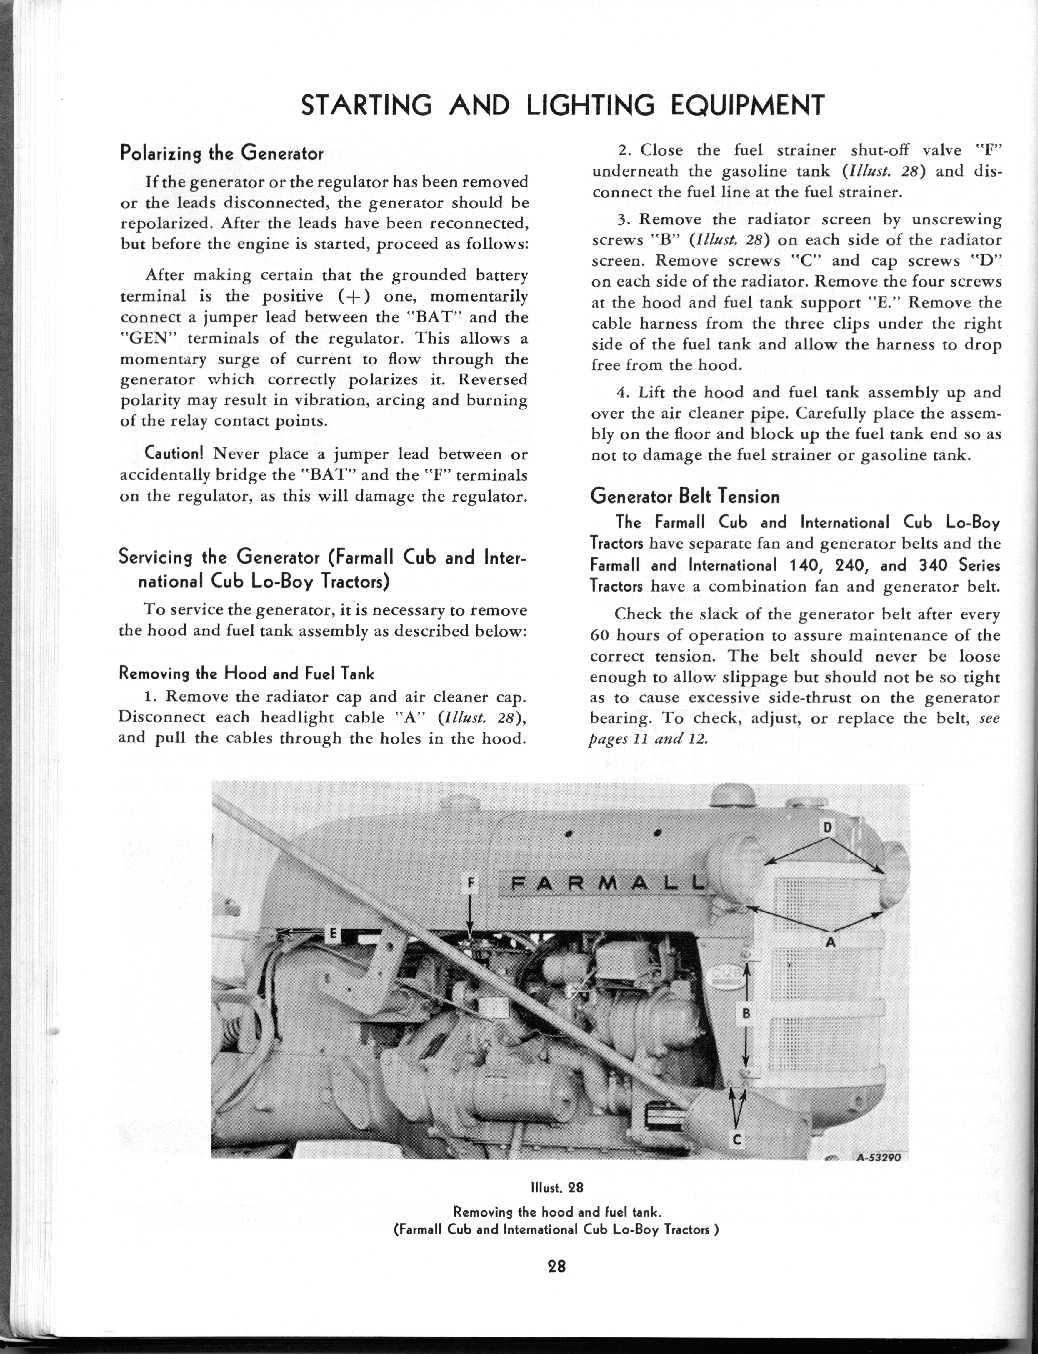 Full Text Of International Cub Tractor Wiring Collection 01 Harvetser Company Mccormick Farmall Manuals